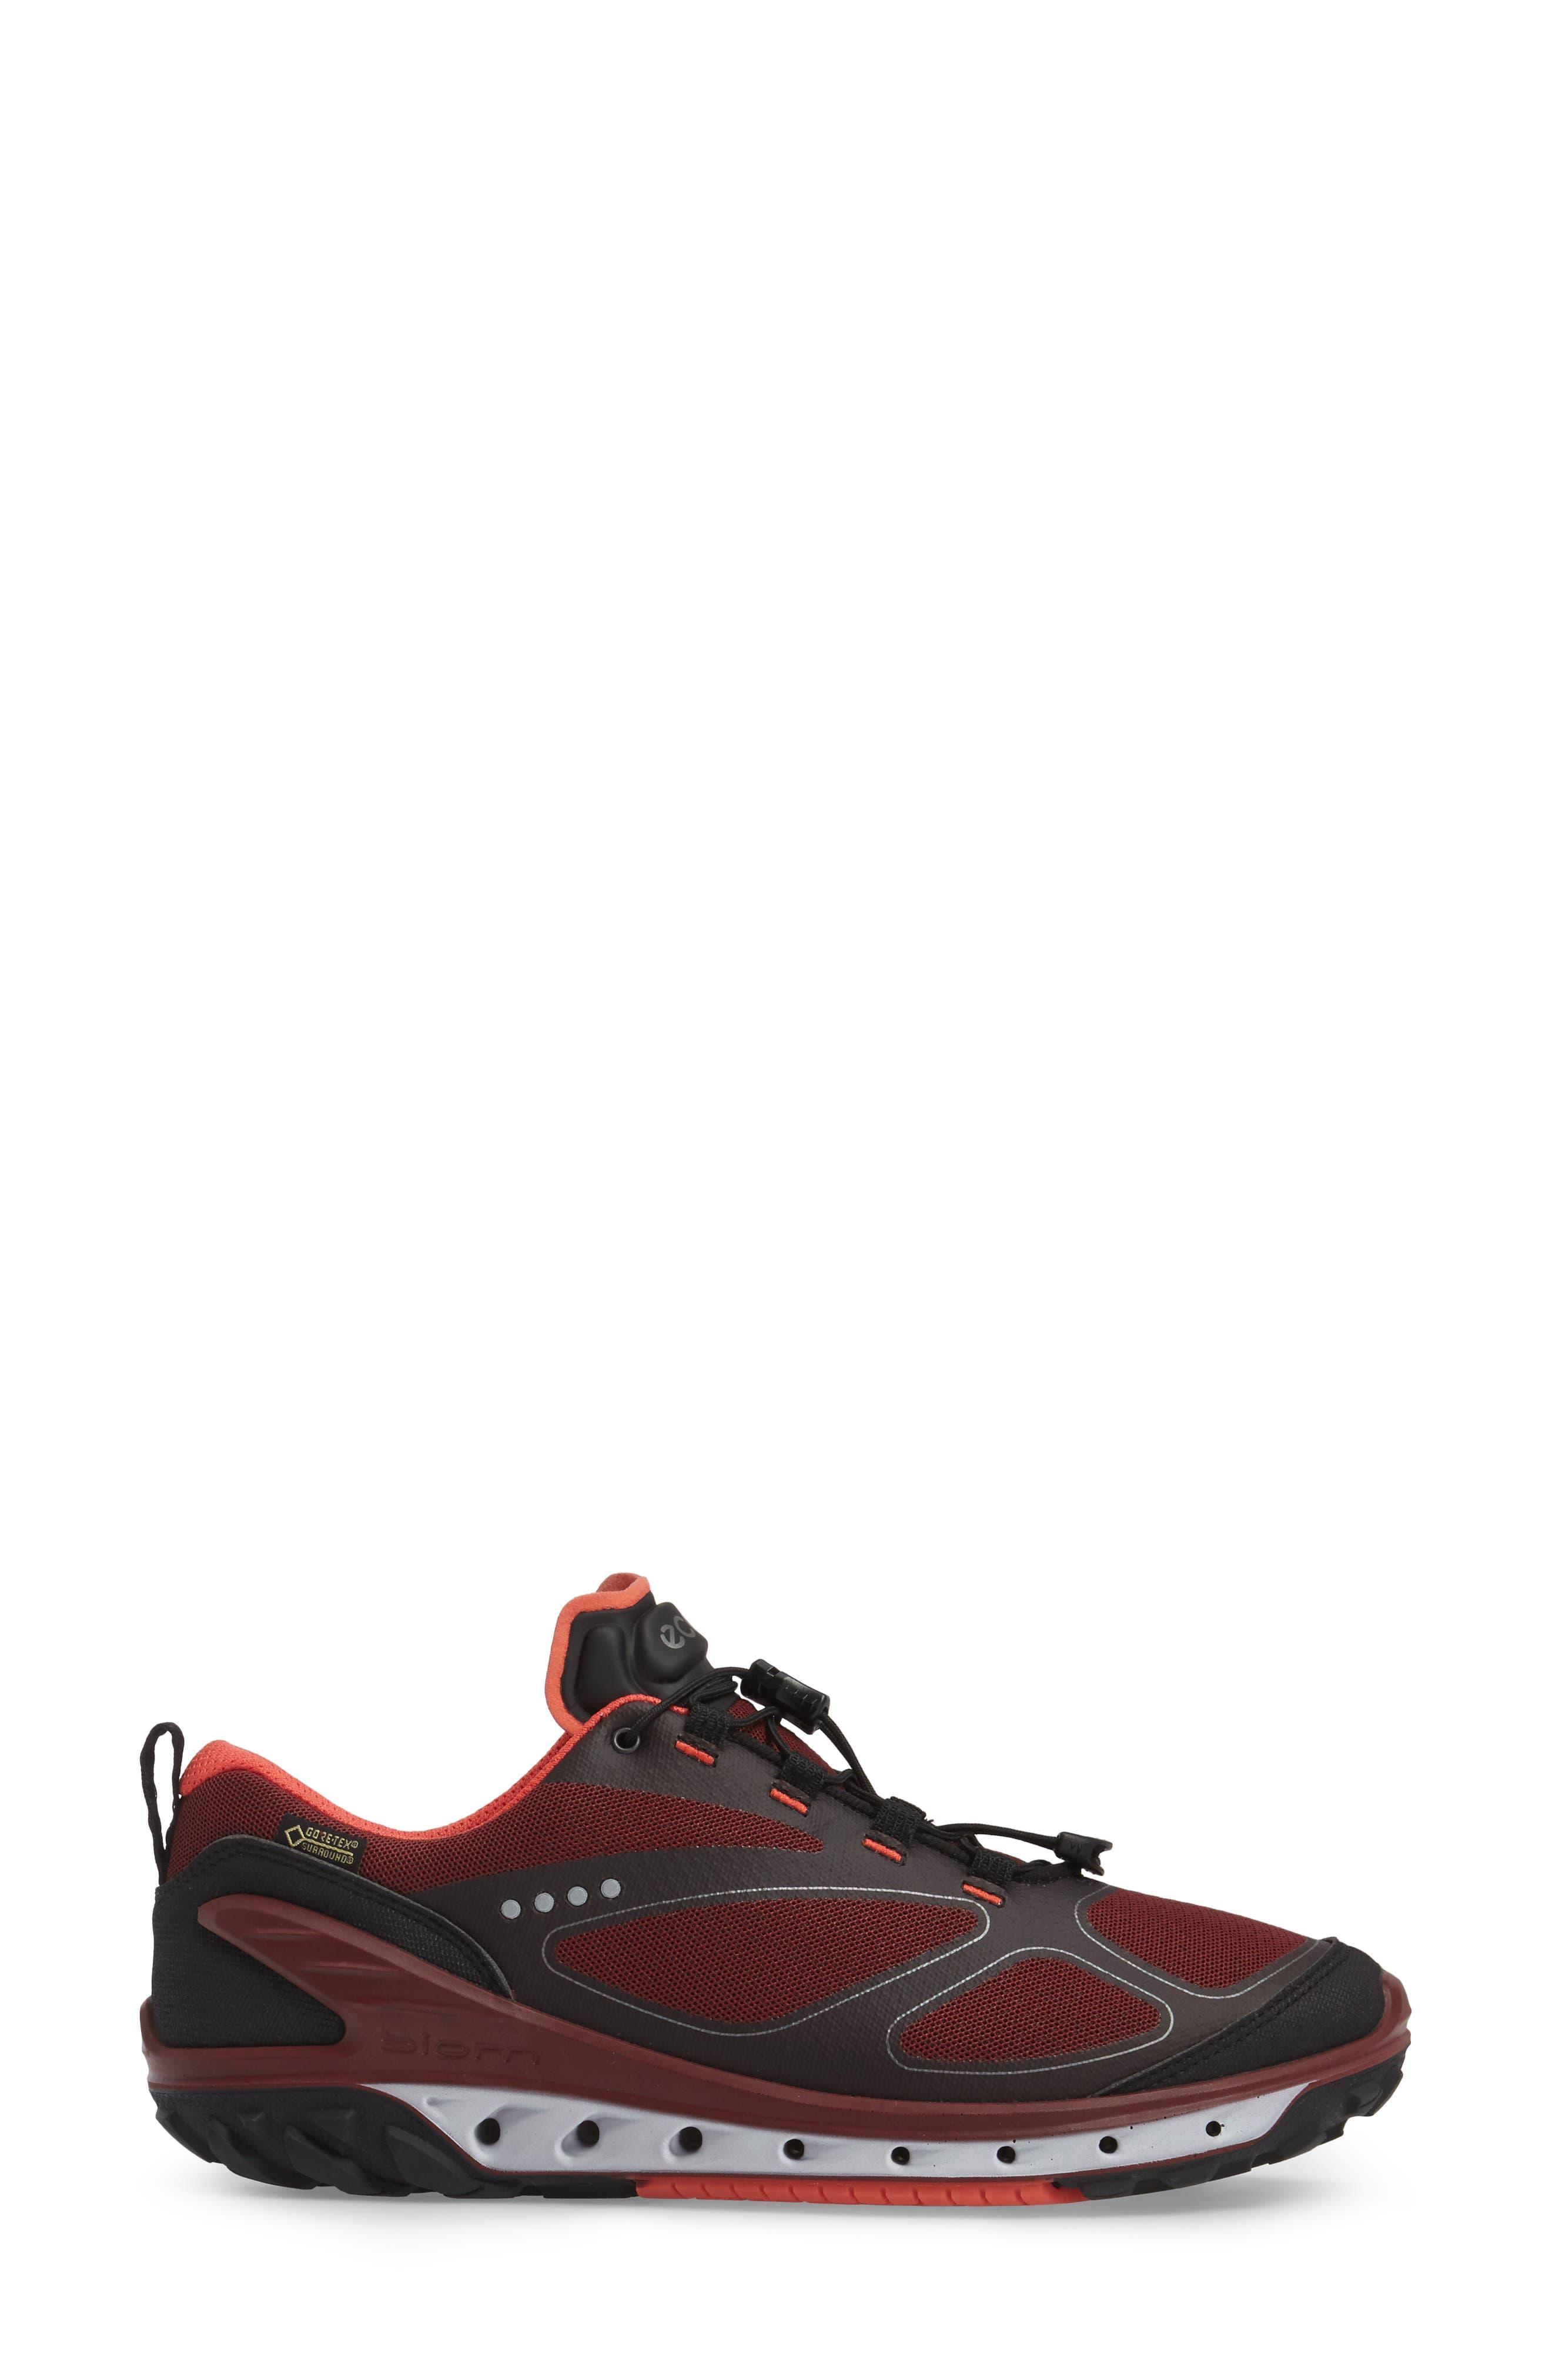 BIOM Venture GTX Sneaker,                             Alternate thumbnail 3, color,                             Black/ Coral Blush Fabric